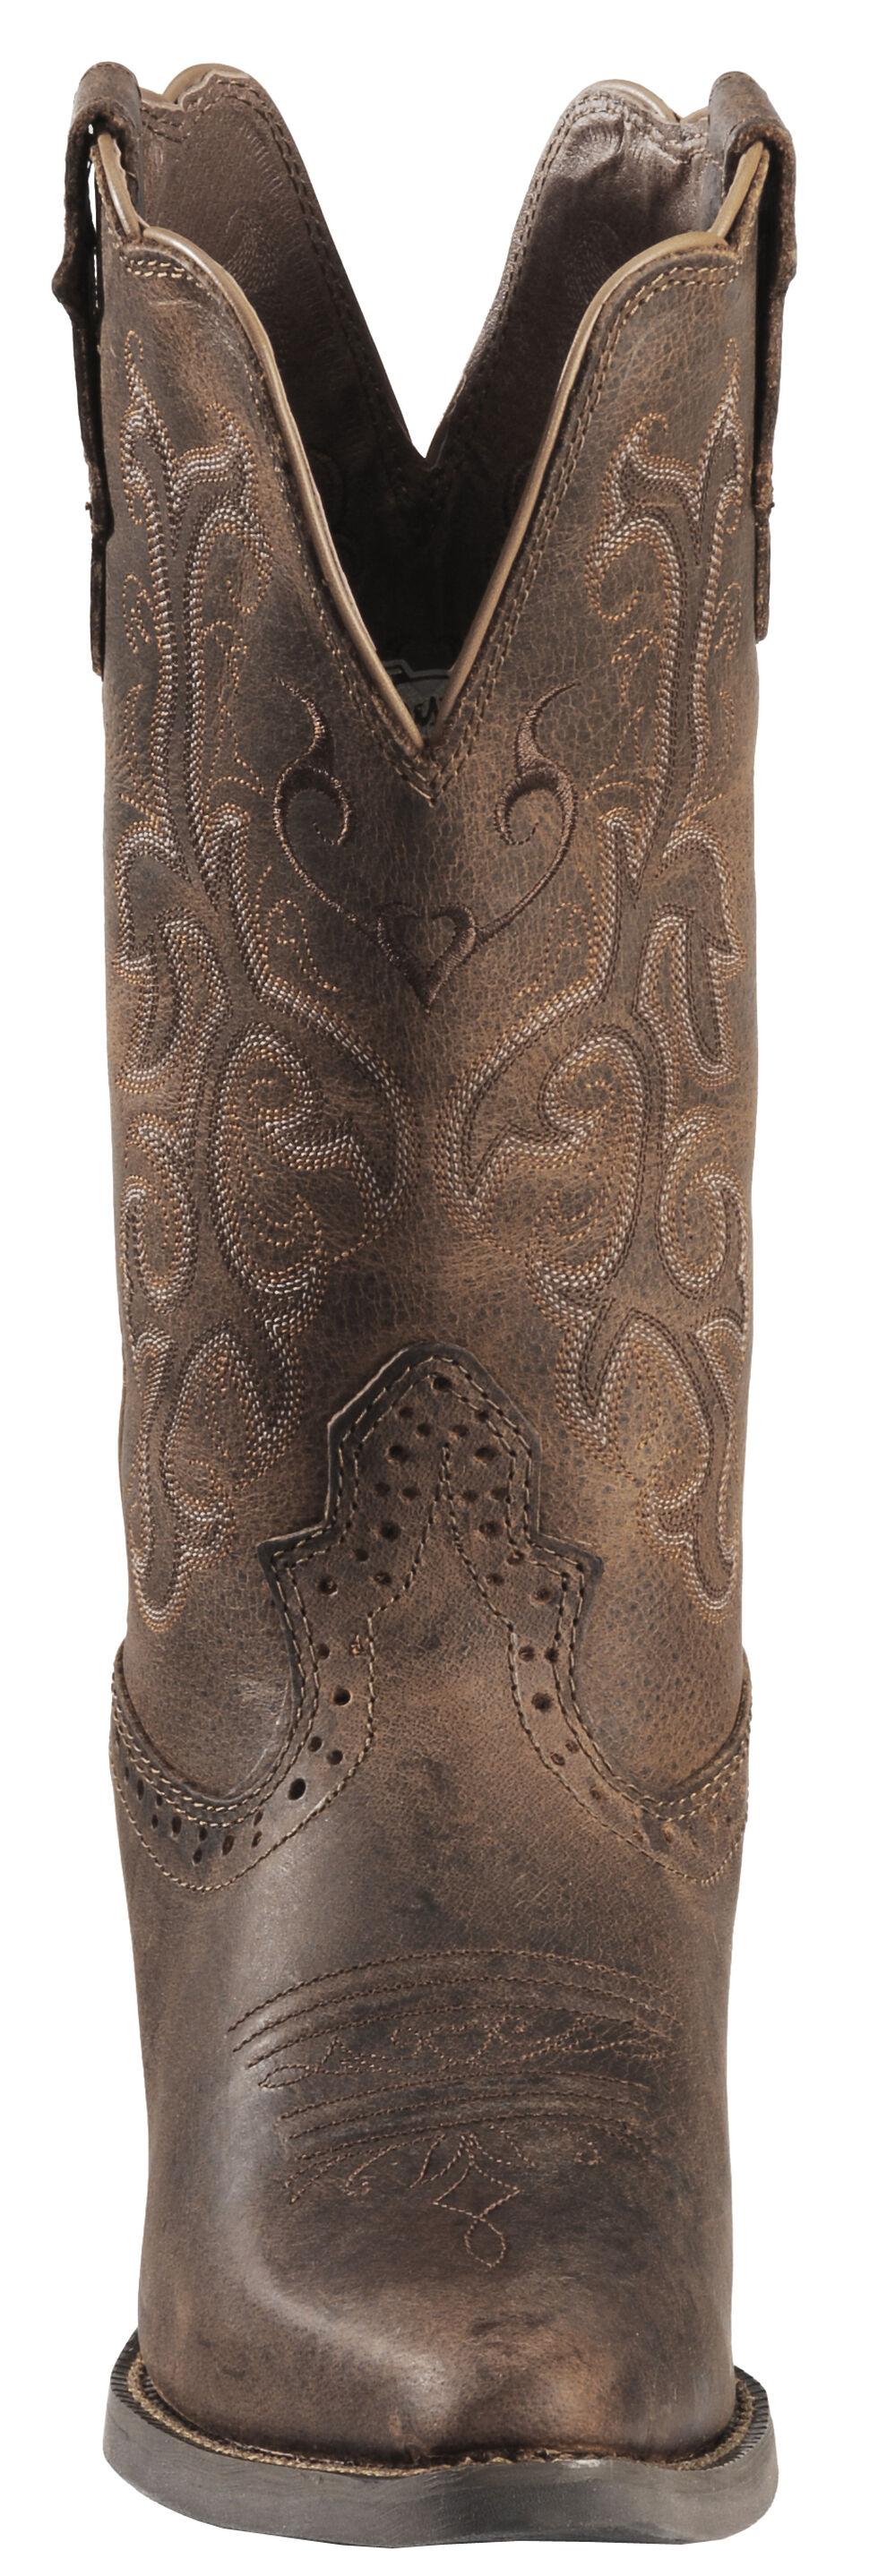 Justin Stampede Women's McKayla Tan Cowgirl Boots - Snip Toe, Tan, hi-res